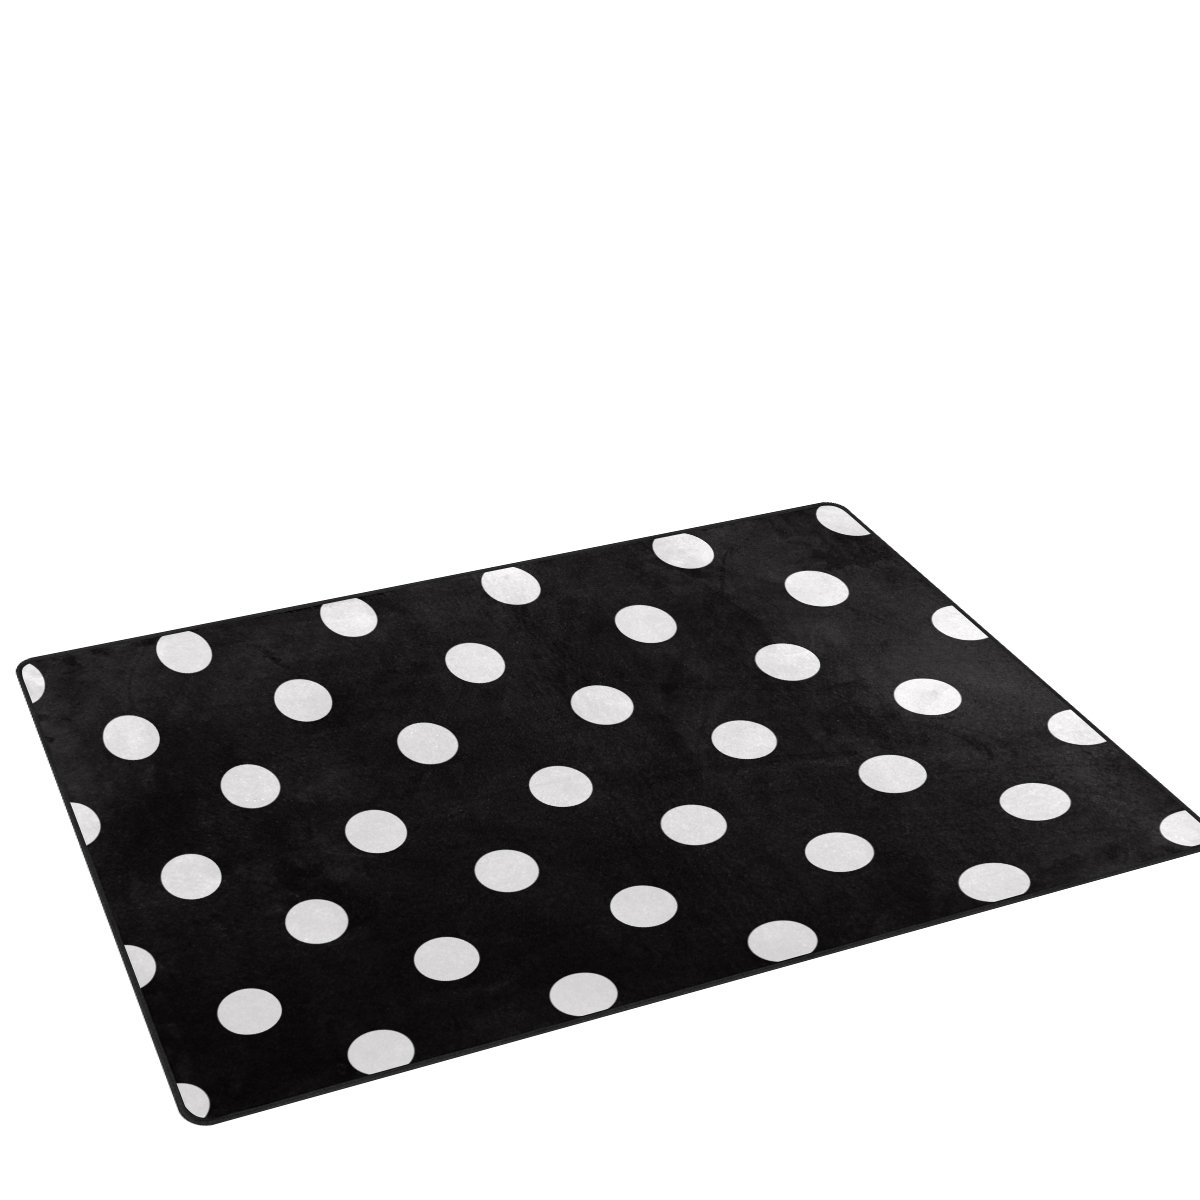 DEYYA Home Contemporary White Black Polka Dot Area Rugs 3 x5 , Modern Non-Slip Doormats Carpet for Living Dining Room Bedroom Hallway Office Easy Clean Footcloth